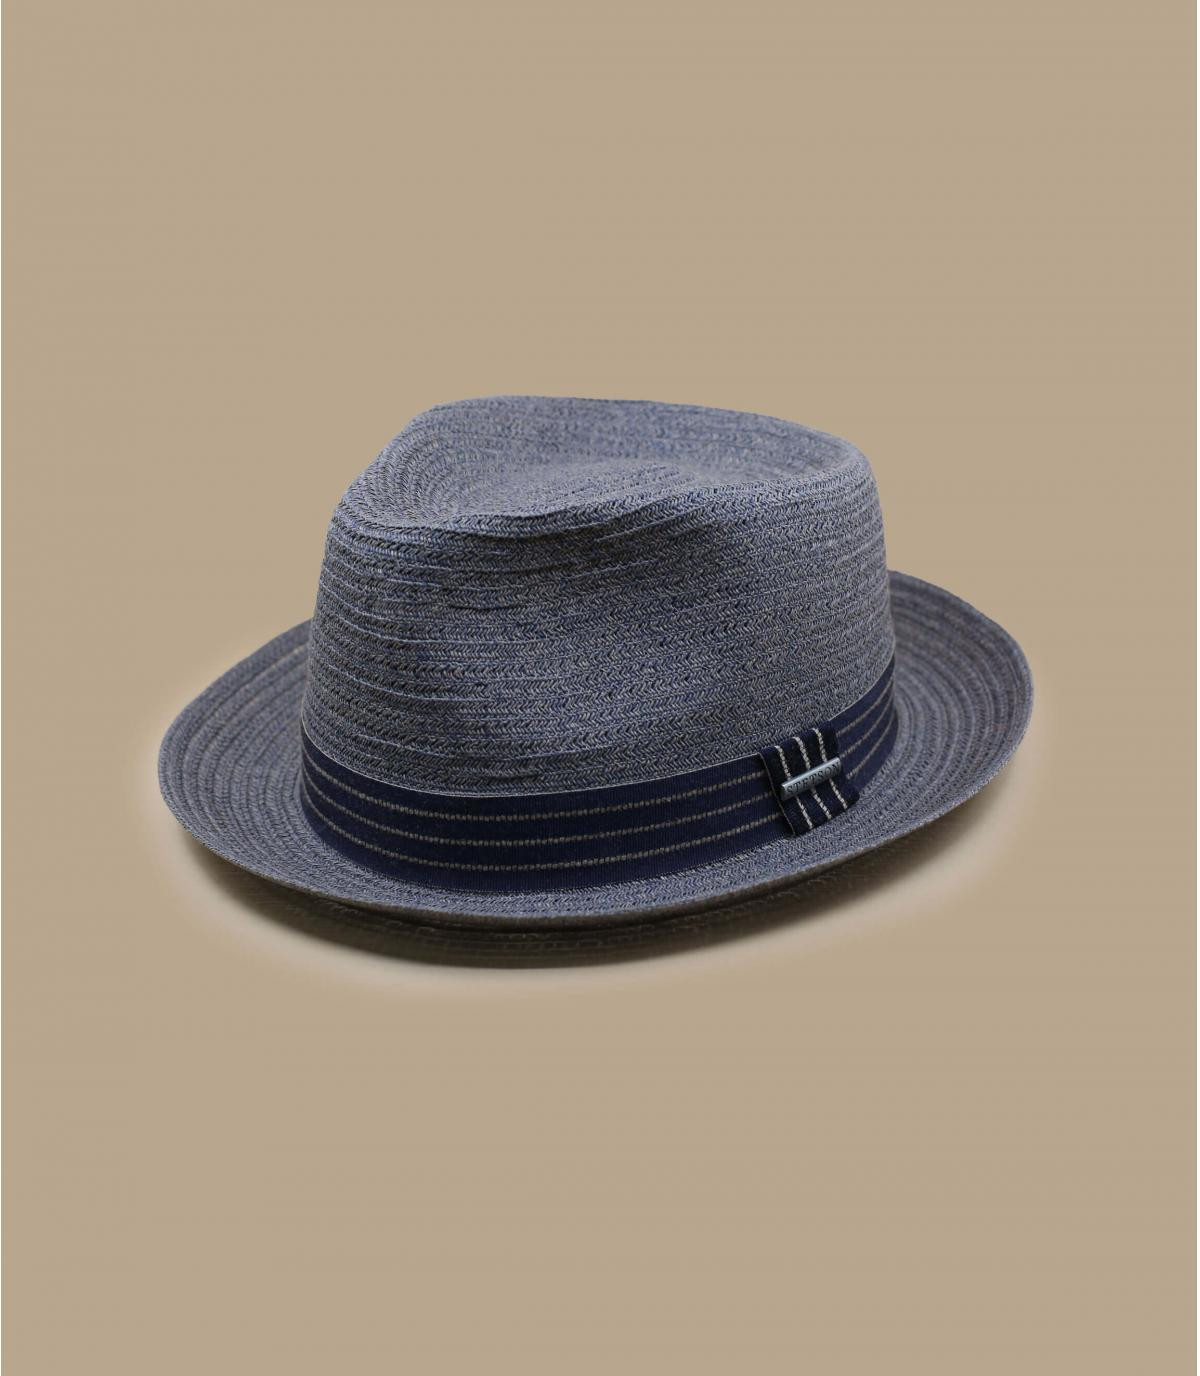 Sombrero paja azul gris